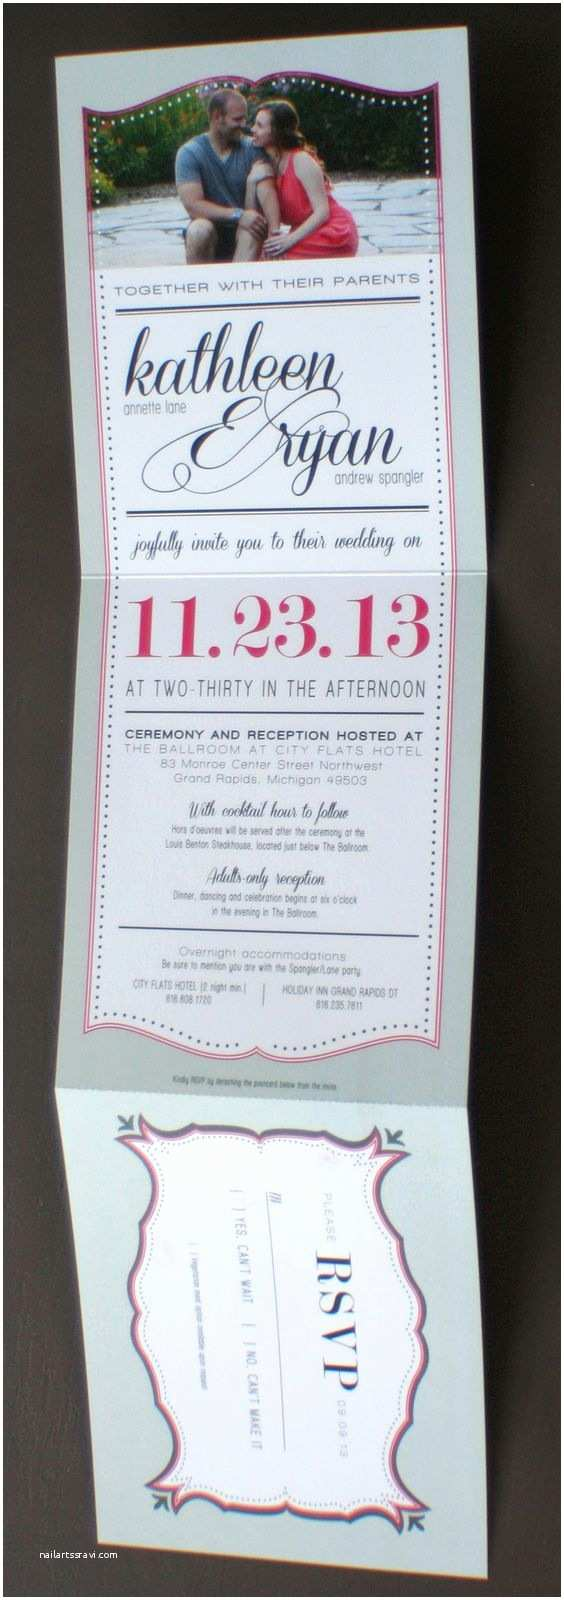 Tear Off Rsvp Wedding Invitations Long Wedding Invitation with Tear Off Rsvp Postcard